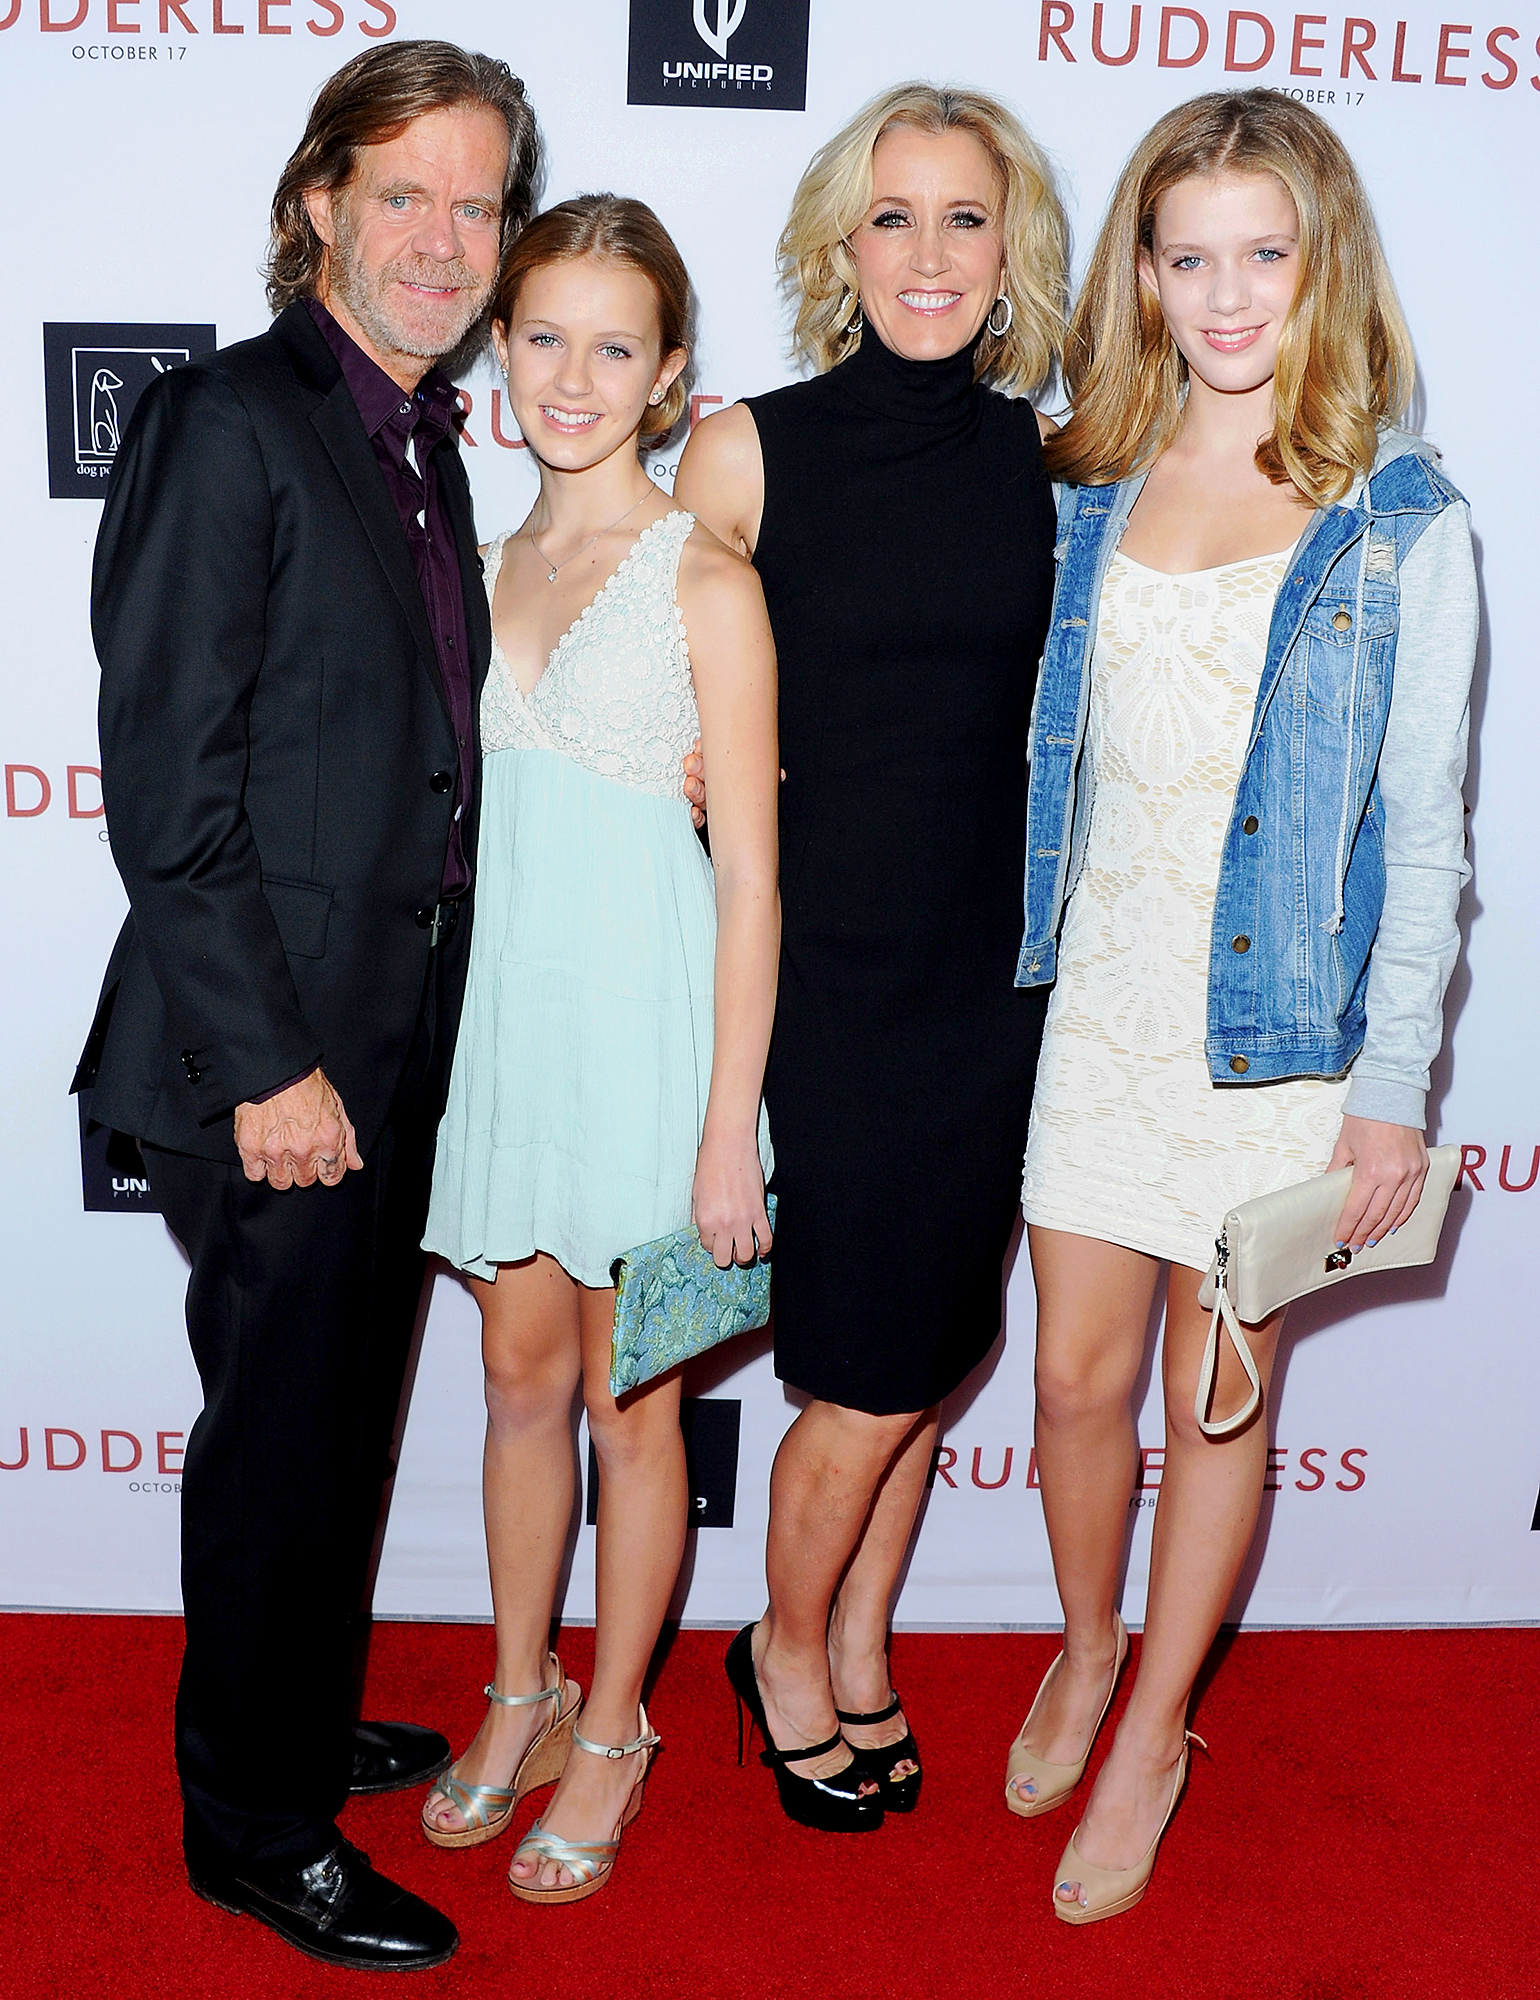 William-H.-Macy,-daughter-Georgia-Macy,-Actress-Felicity-Huffman-and-daughter-Sophia-Macy